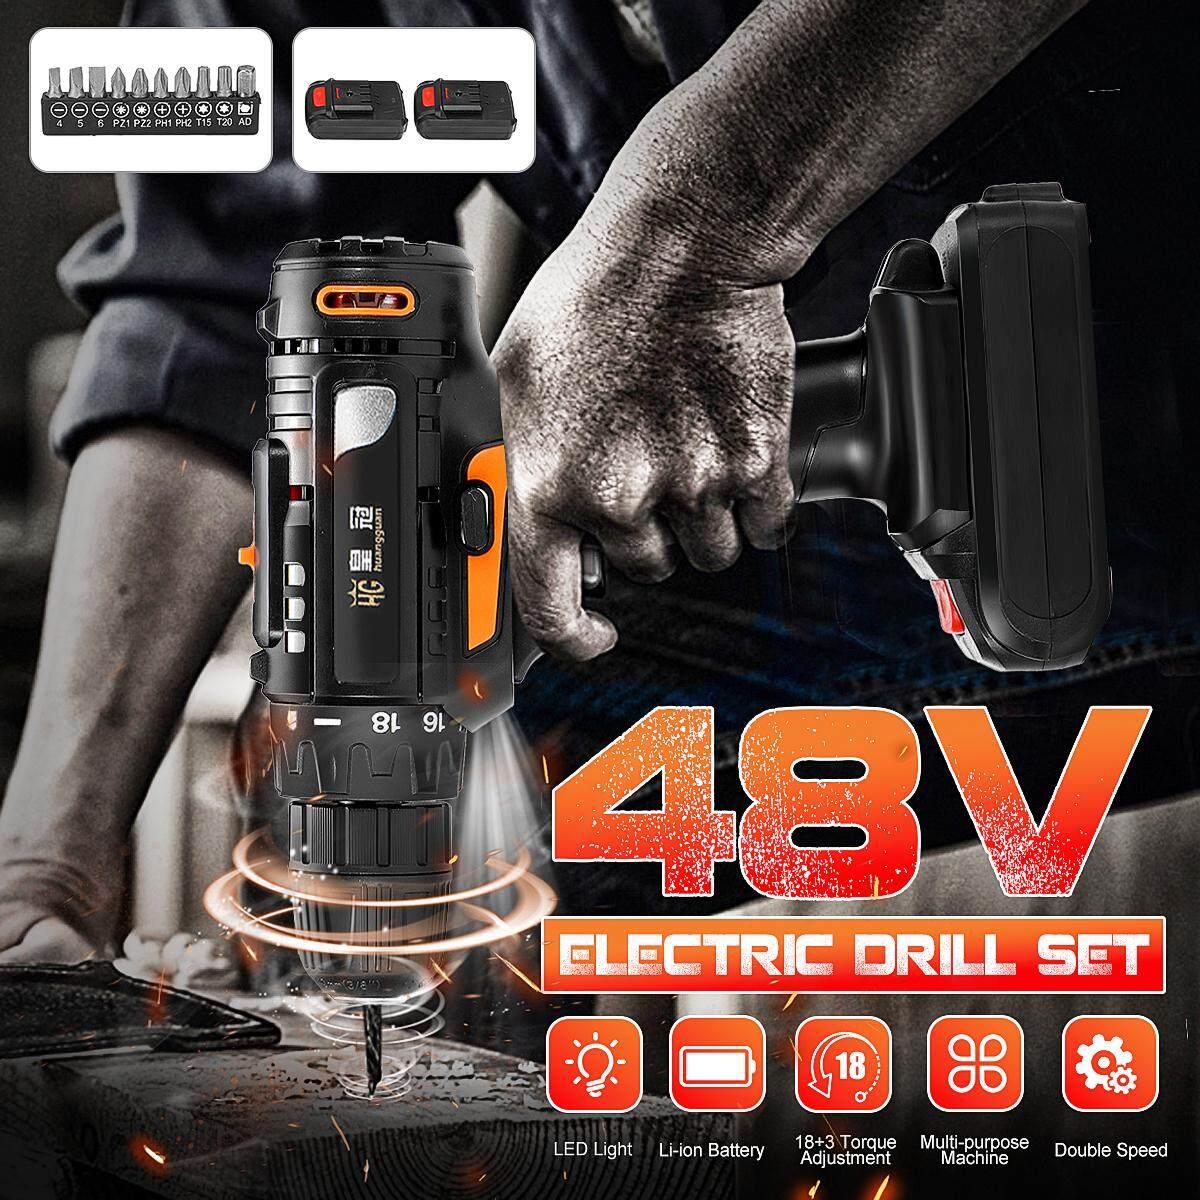 EU Plug 48V Electric Drill Cordless Rechargeable Driver Drill Screw Set Repair Tools Kit